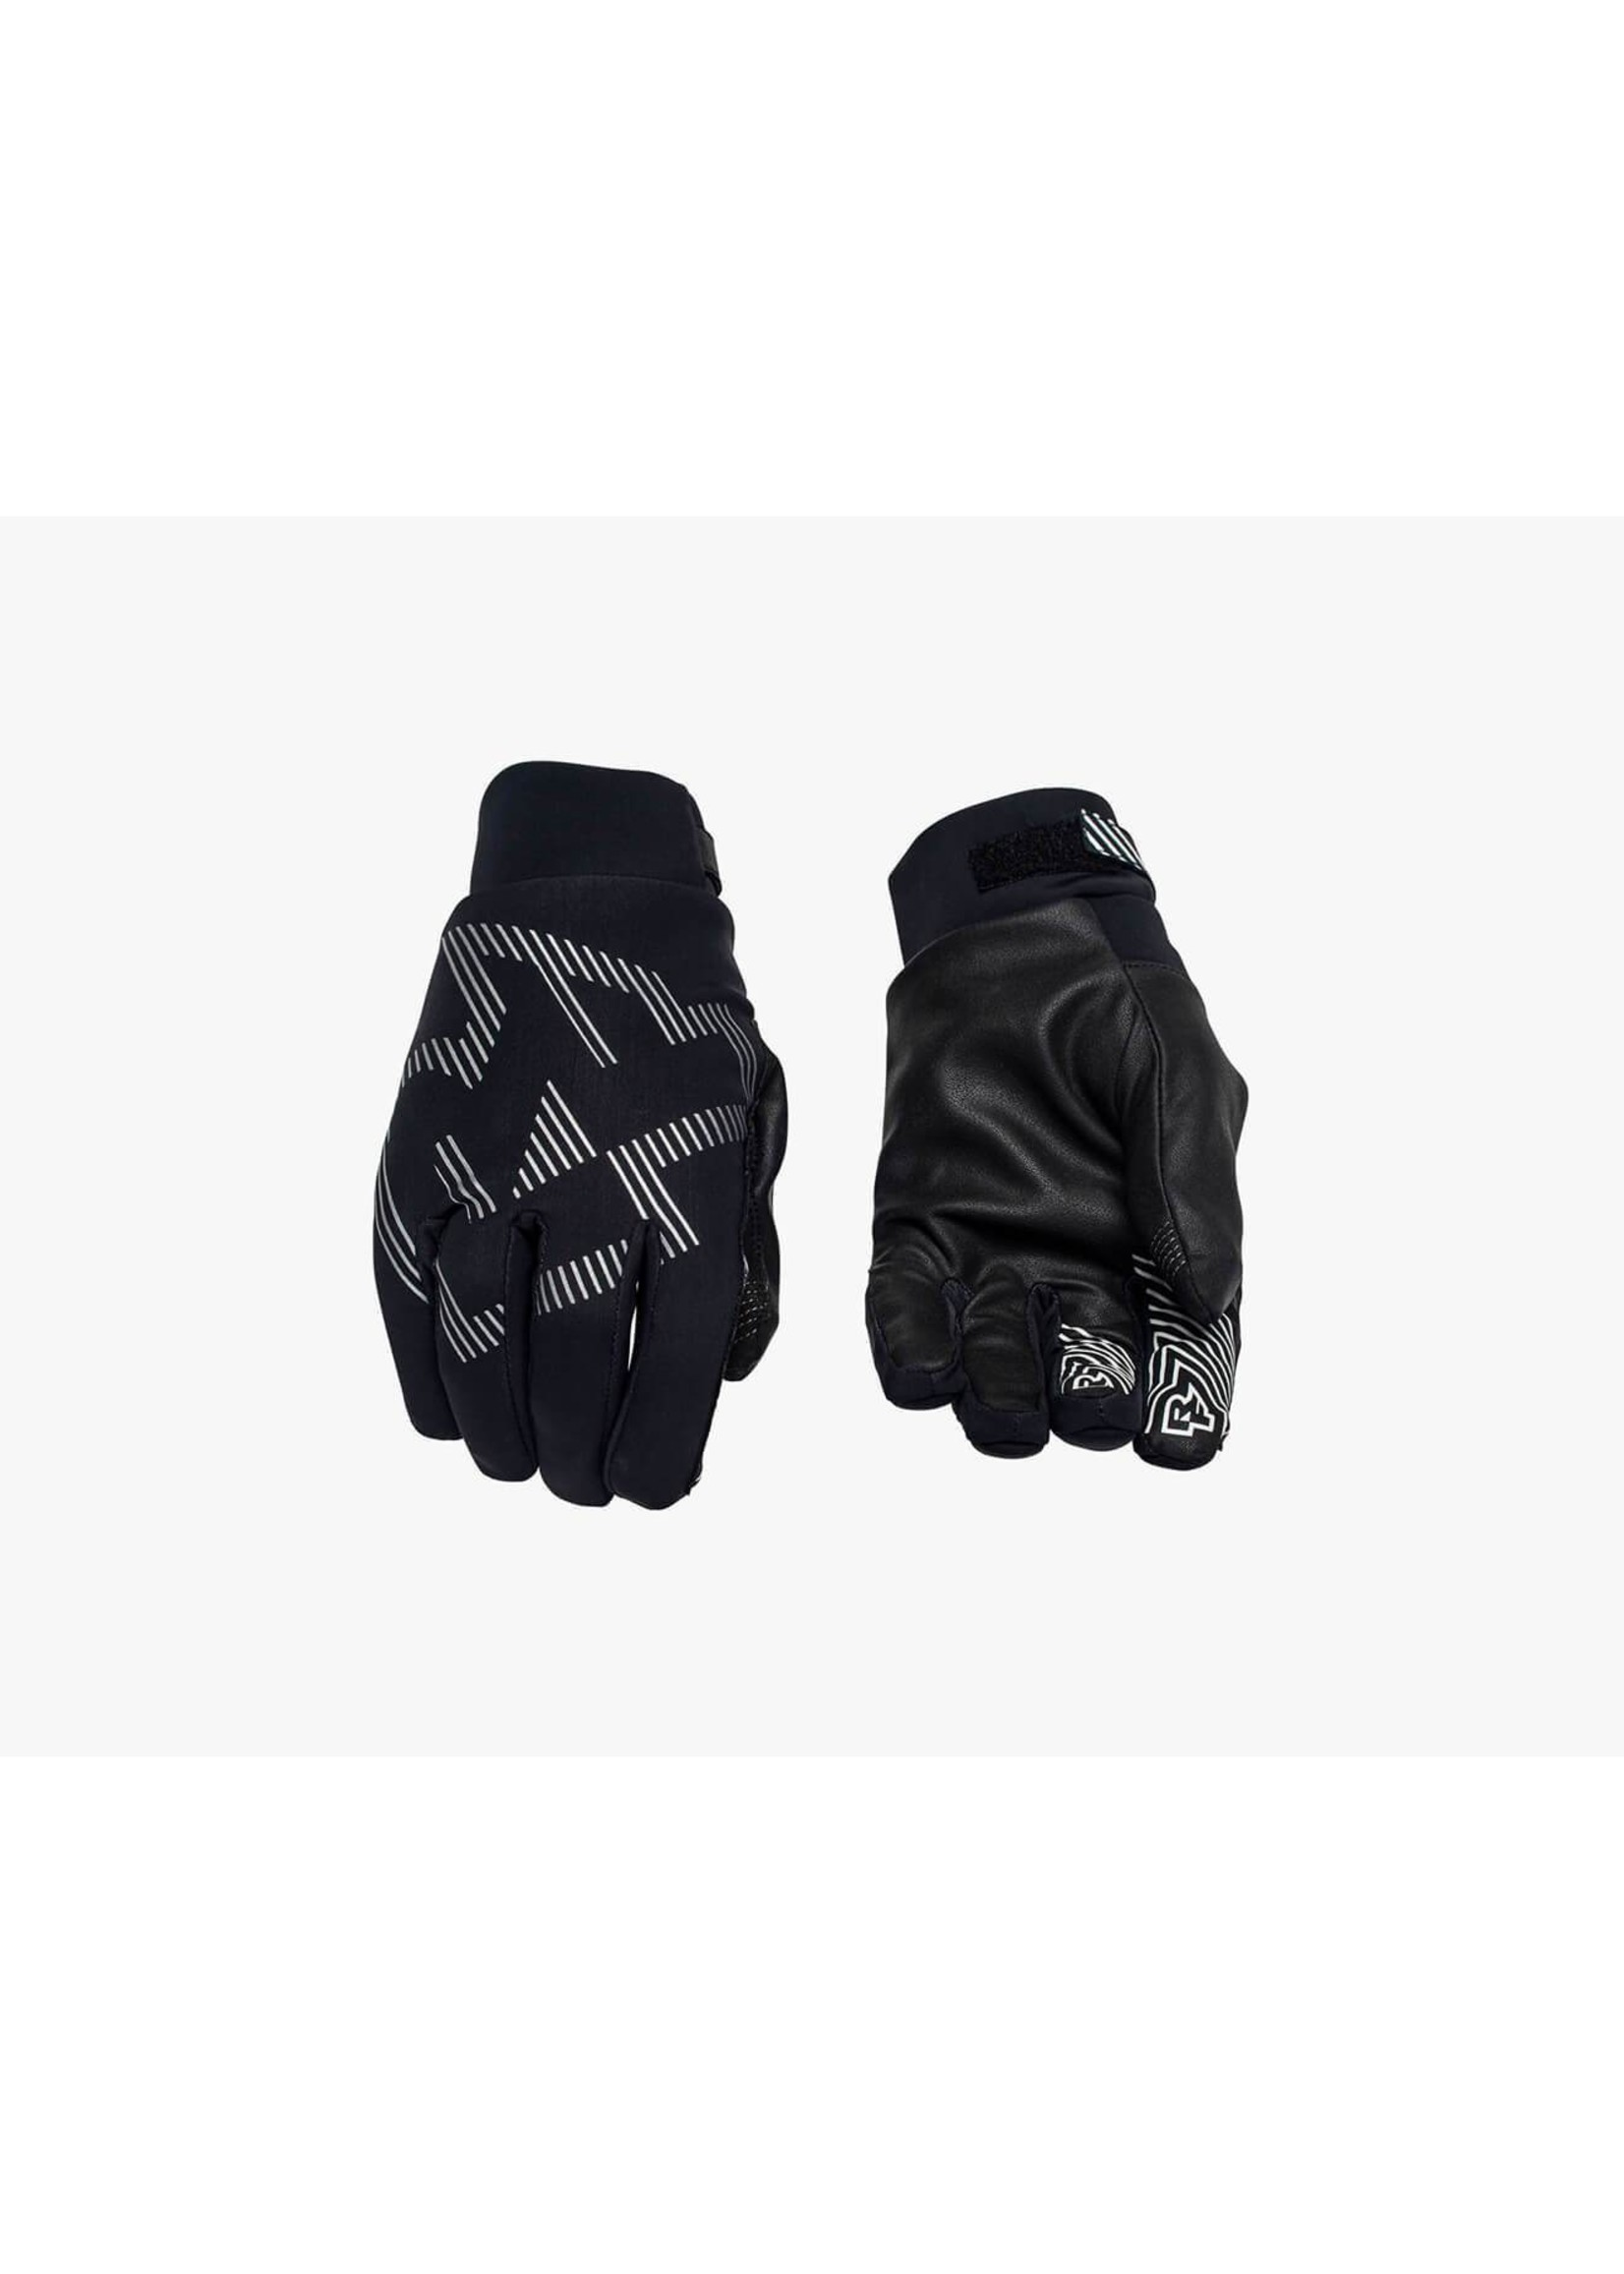 Race Face Conspiracy Gloves, Black,